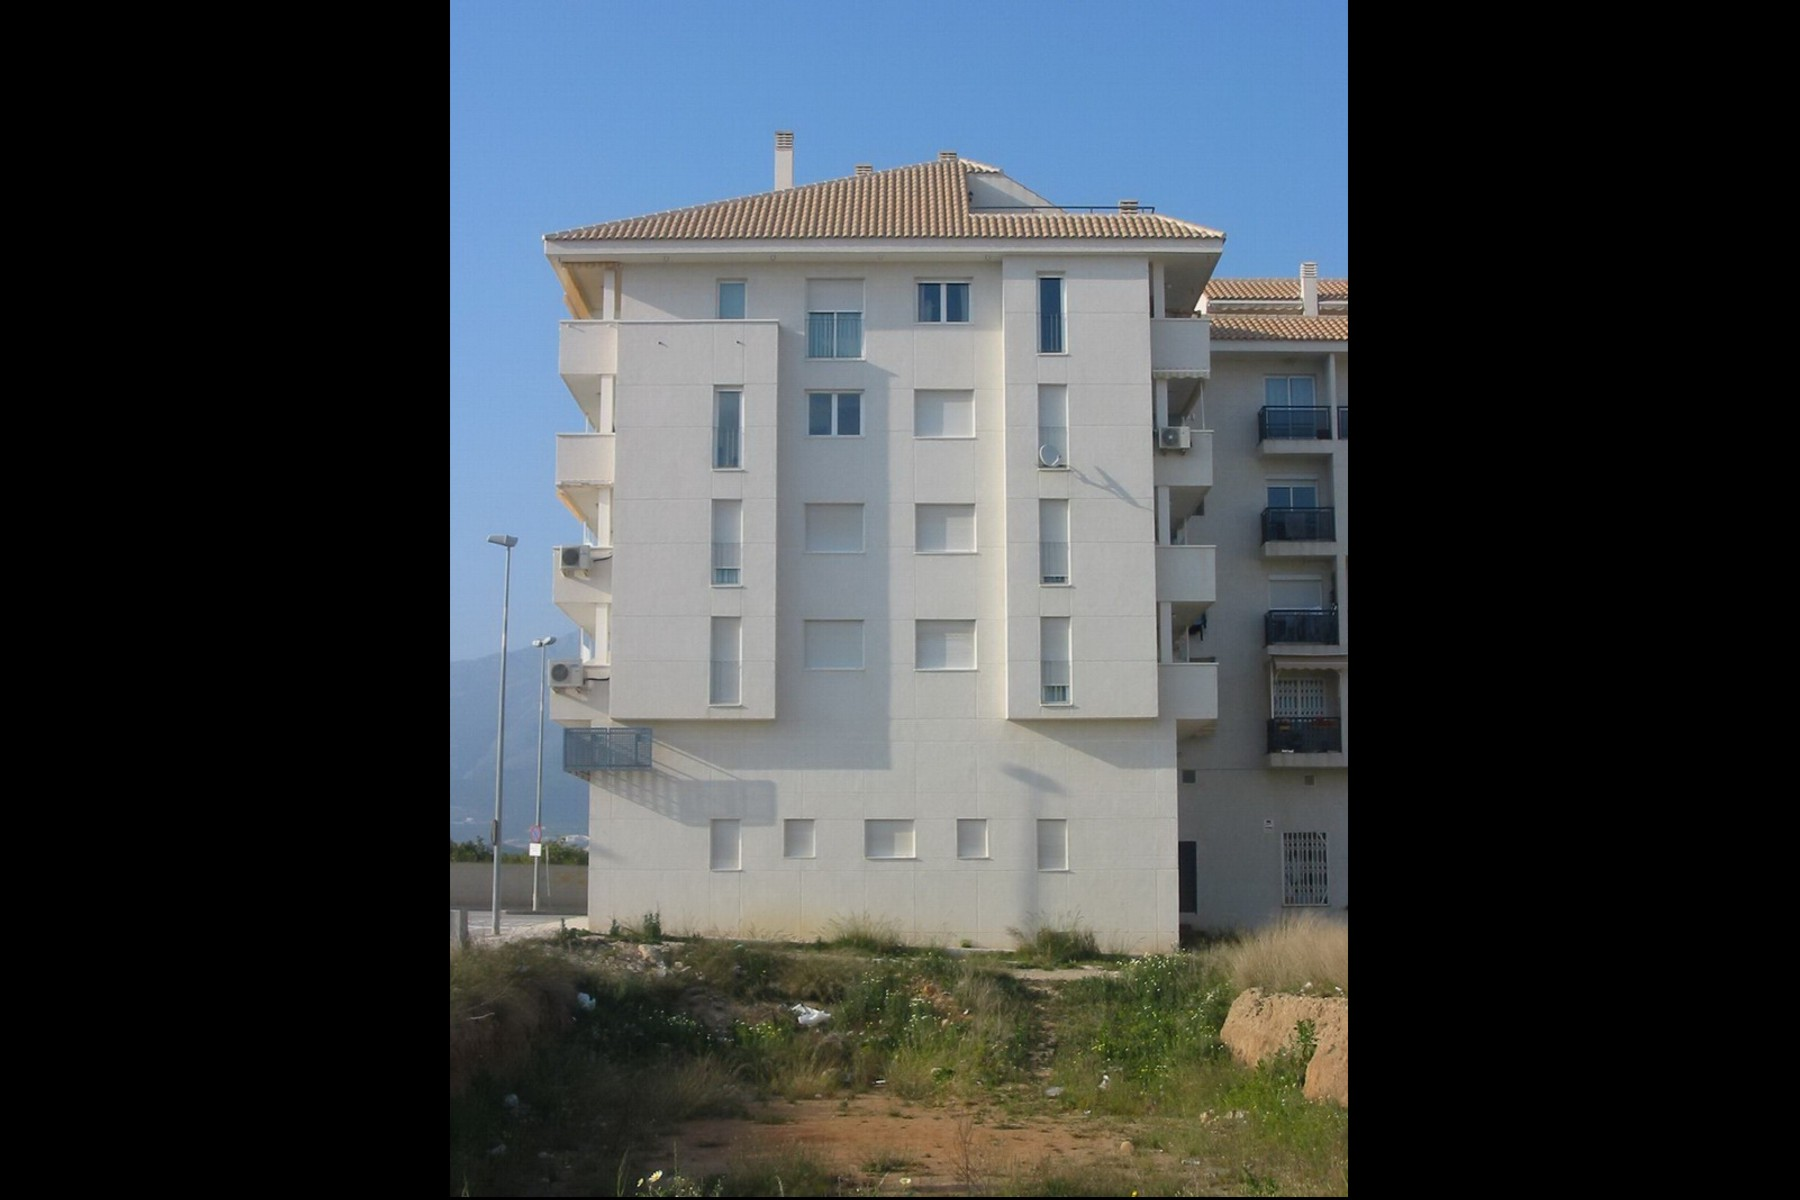 Imaginarq-053-Edificio-Viviendas-Altea-Alicante-07A